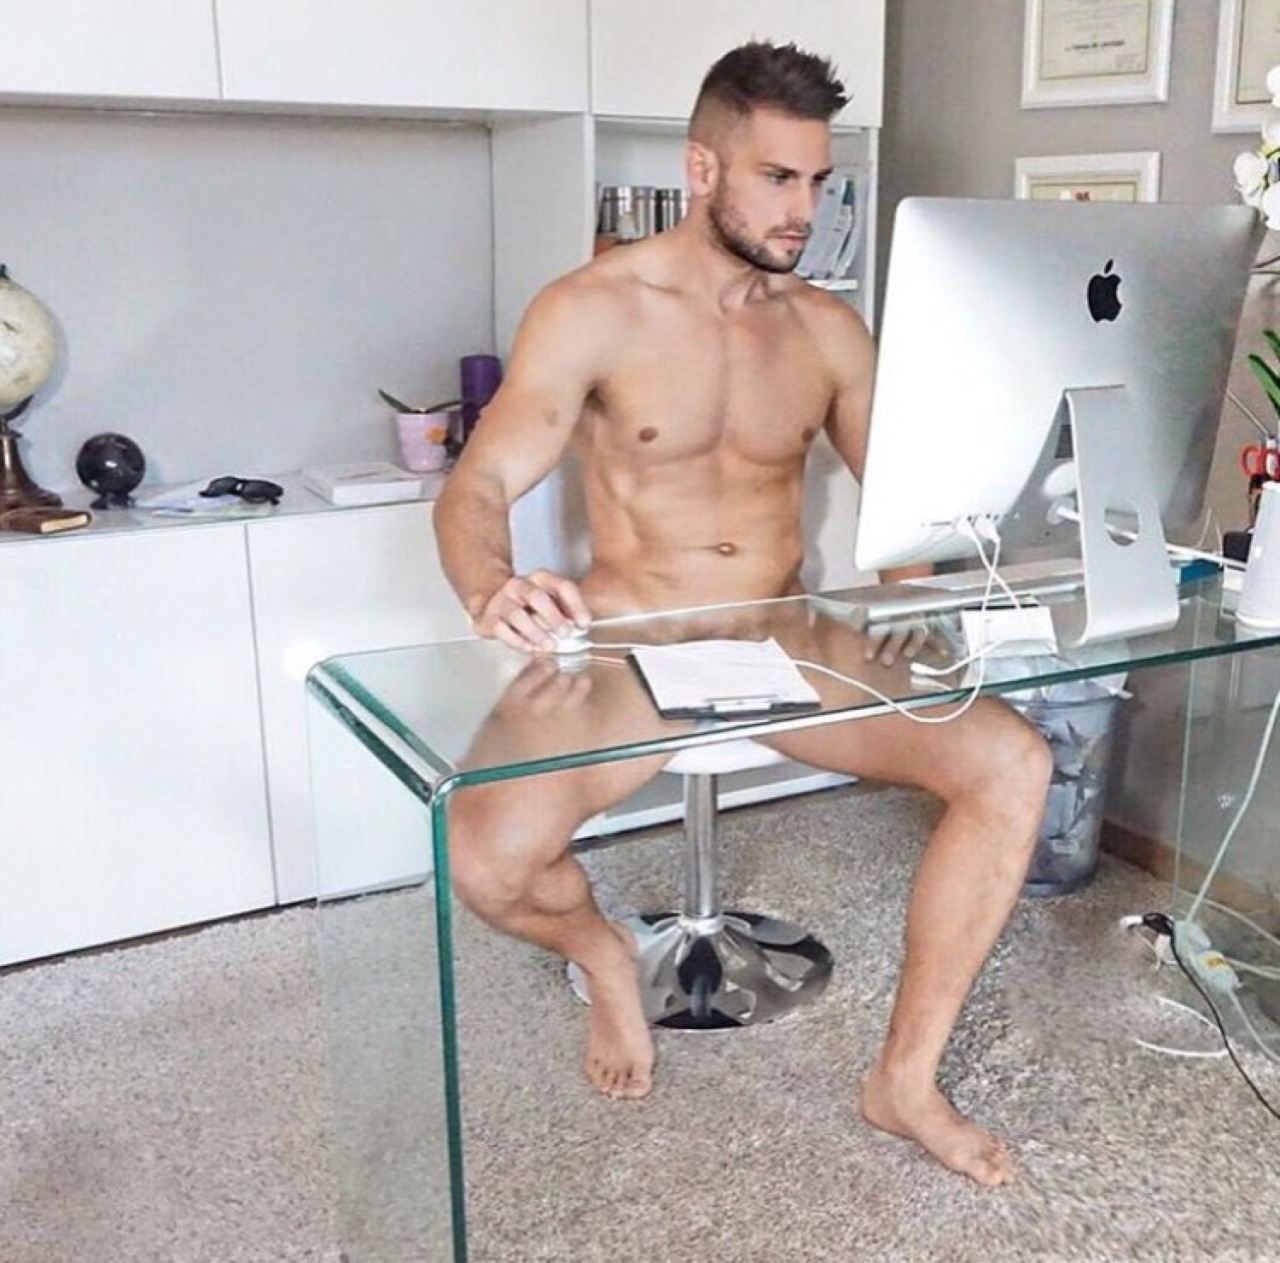 Cmnm Office Cmnm Clothed Men Naked Men